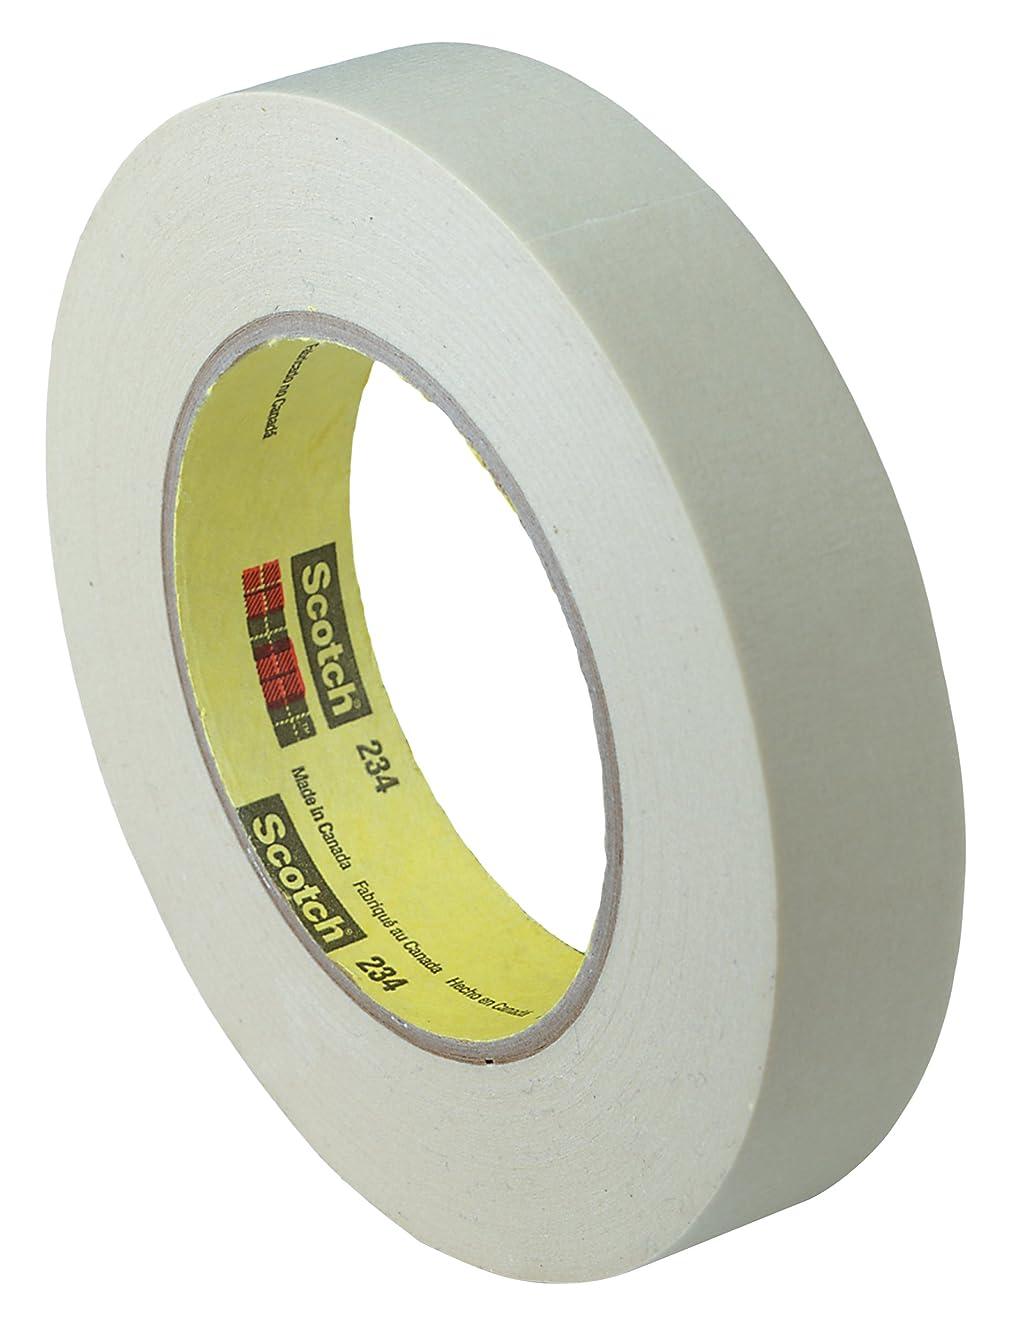 3M 85550-case General Purpose Masking Tape 234 Tan, 24 mm x 55 m, 5.9 mil (Pack of 36)